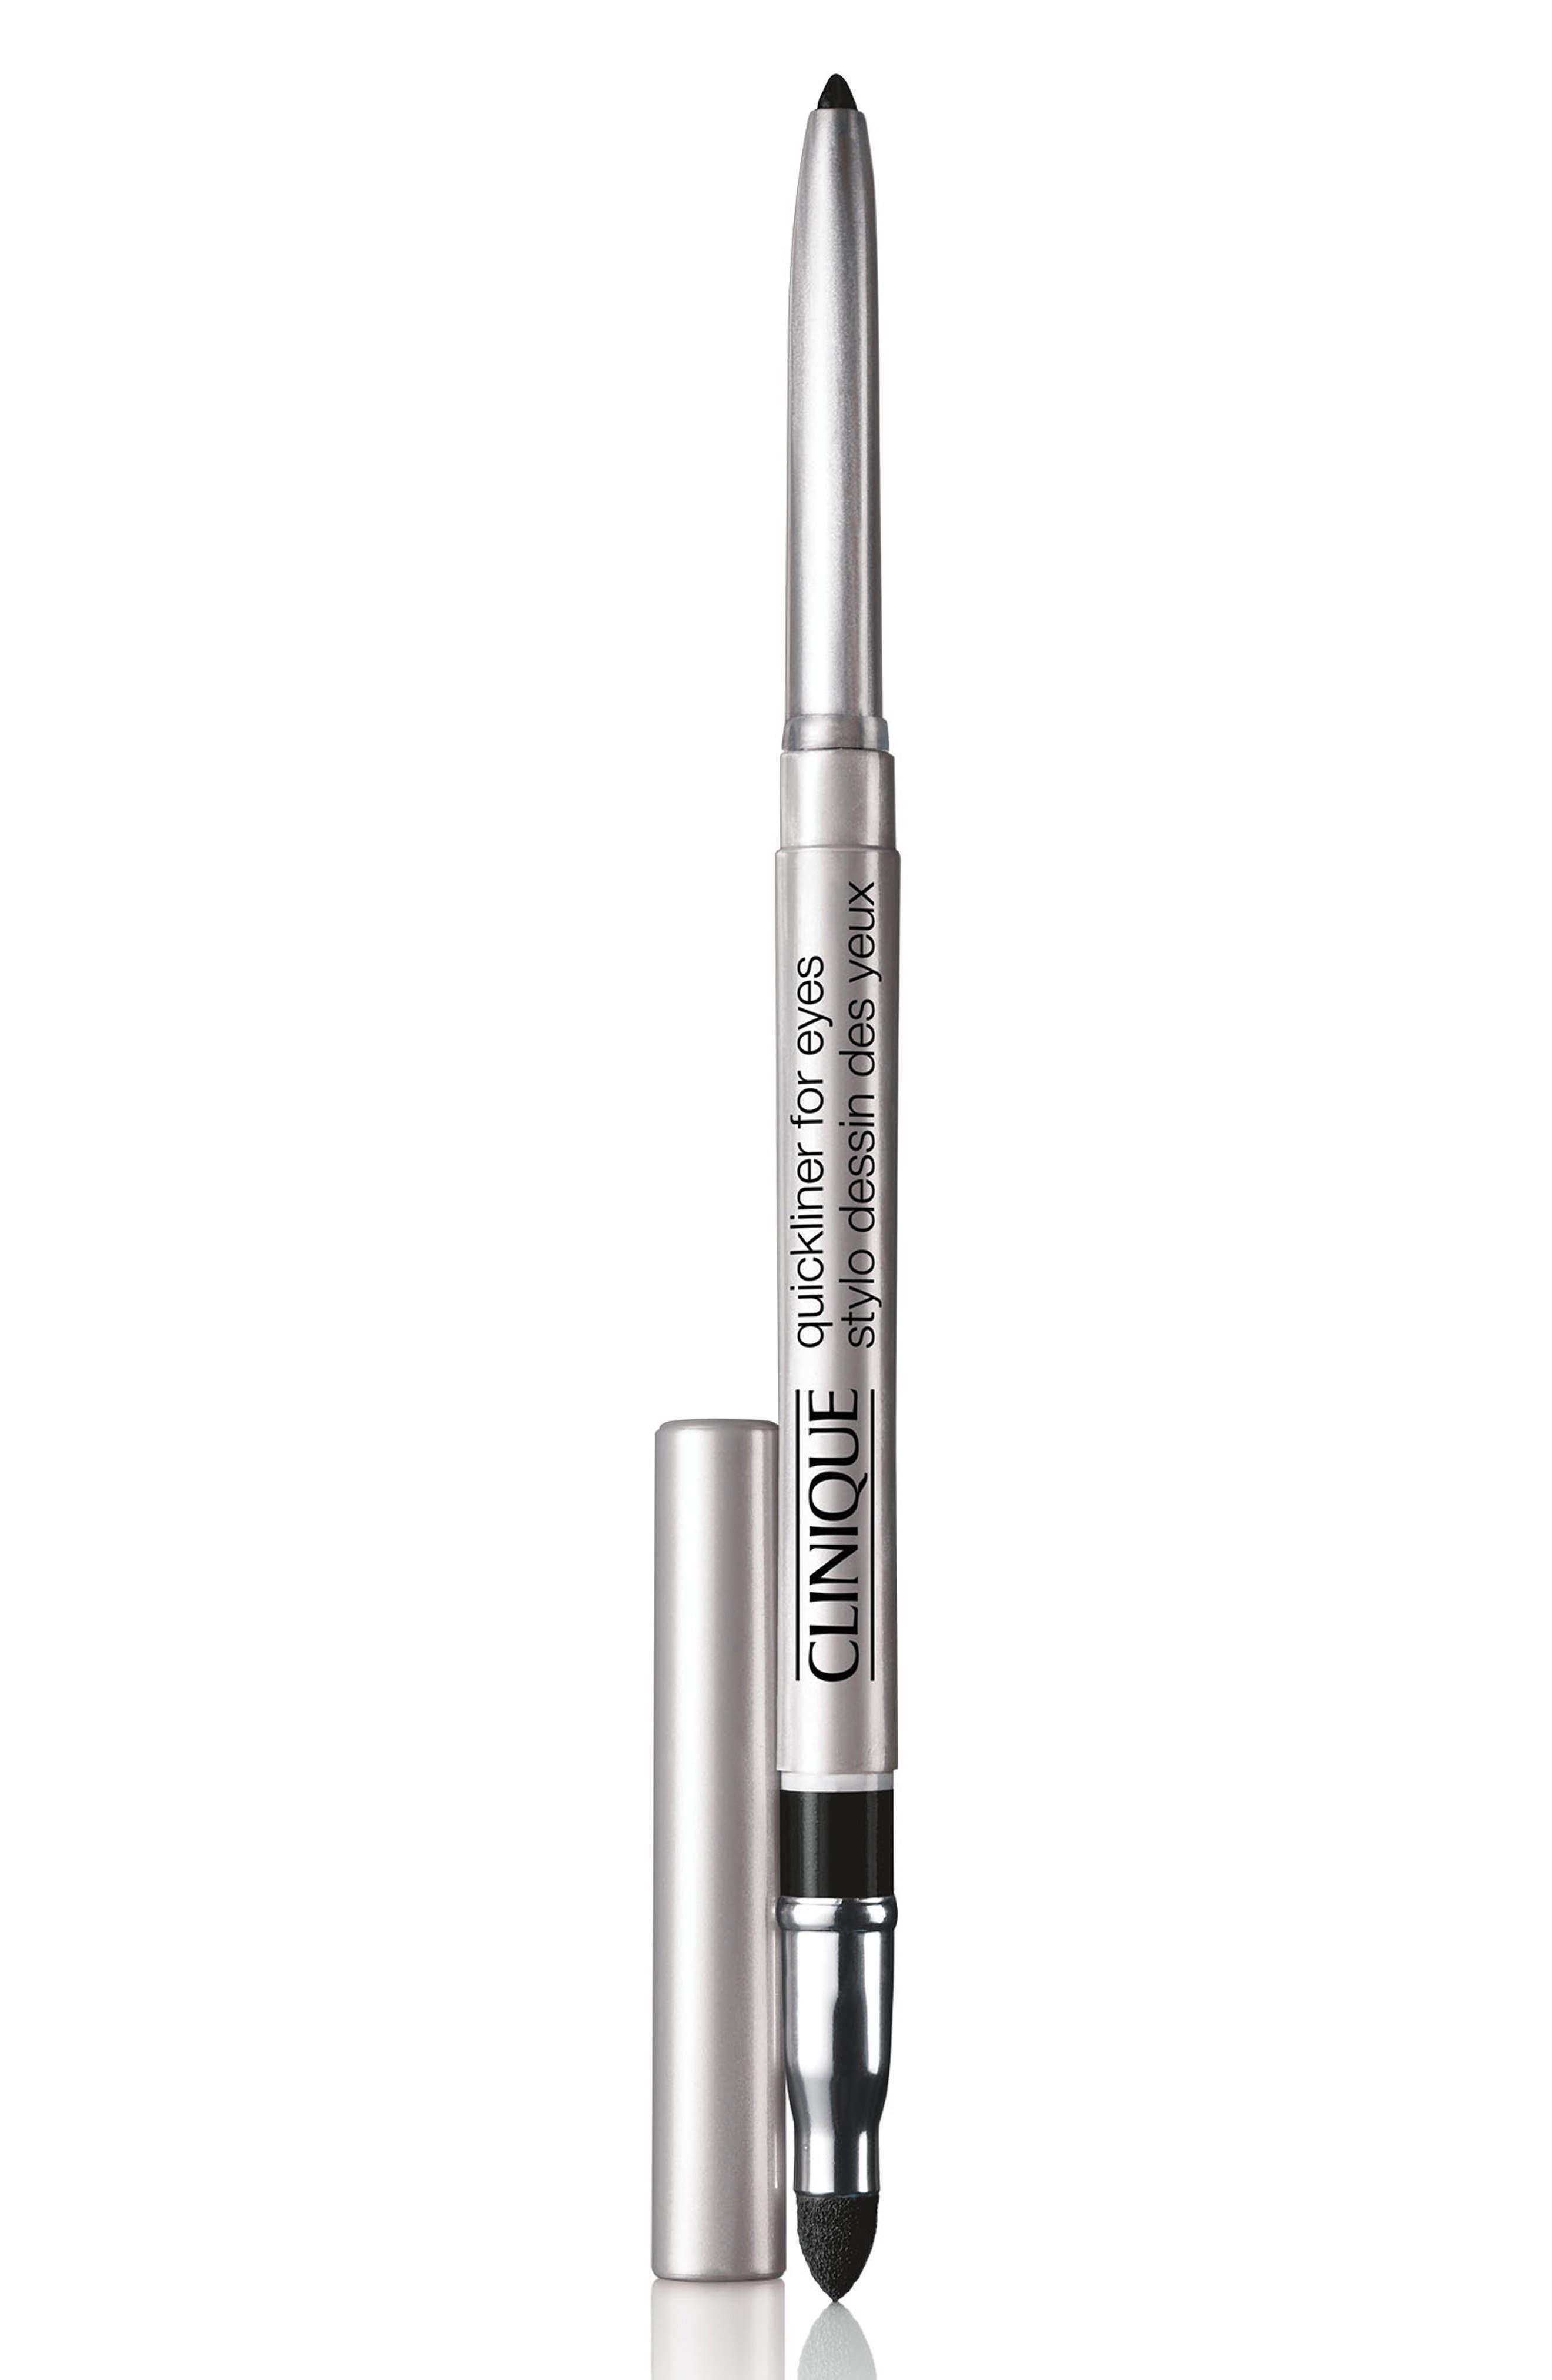 Clinique Quickliner For Eyes Eyeliner Pencil - Really Black